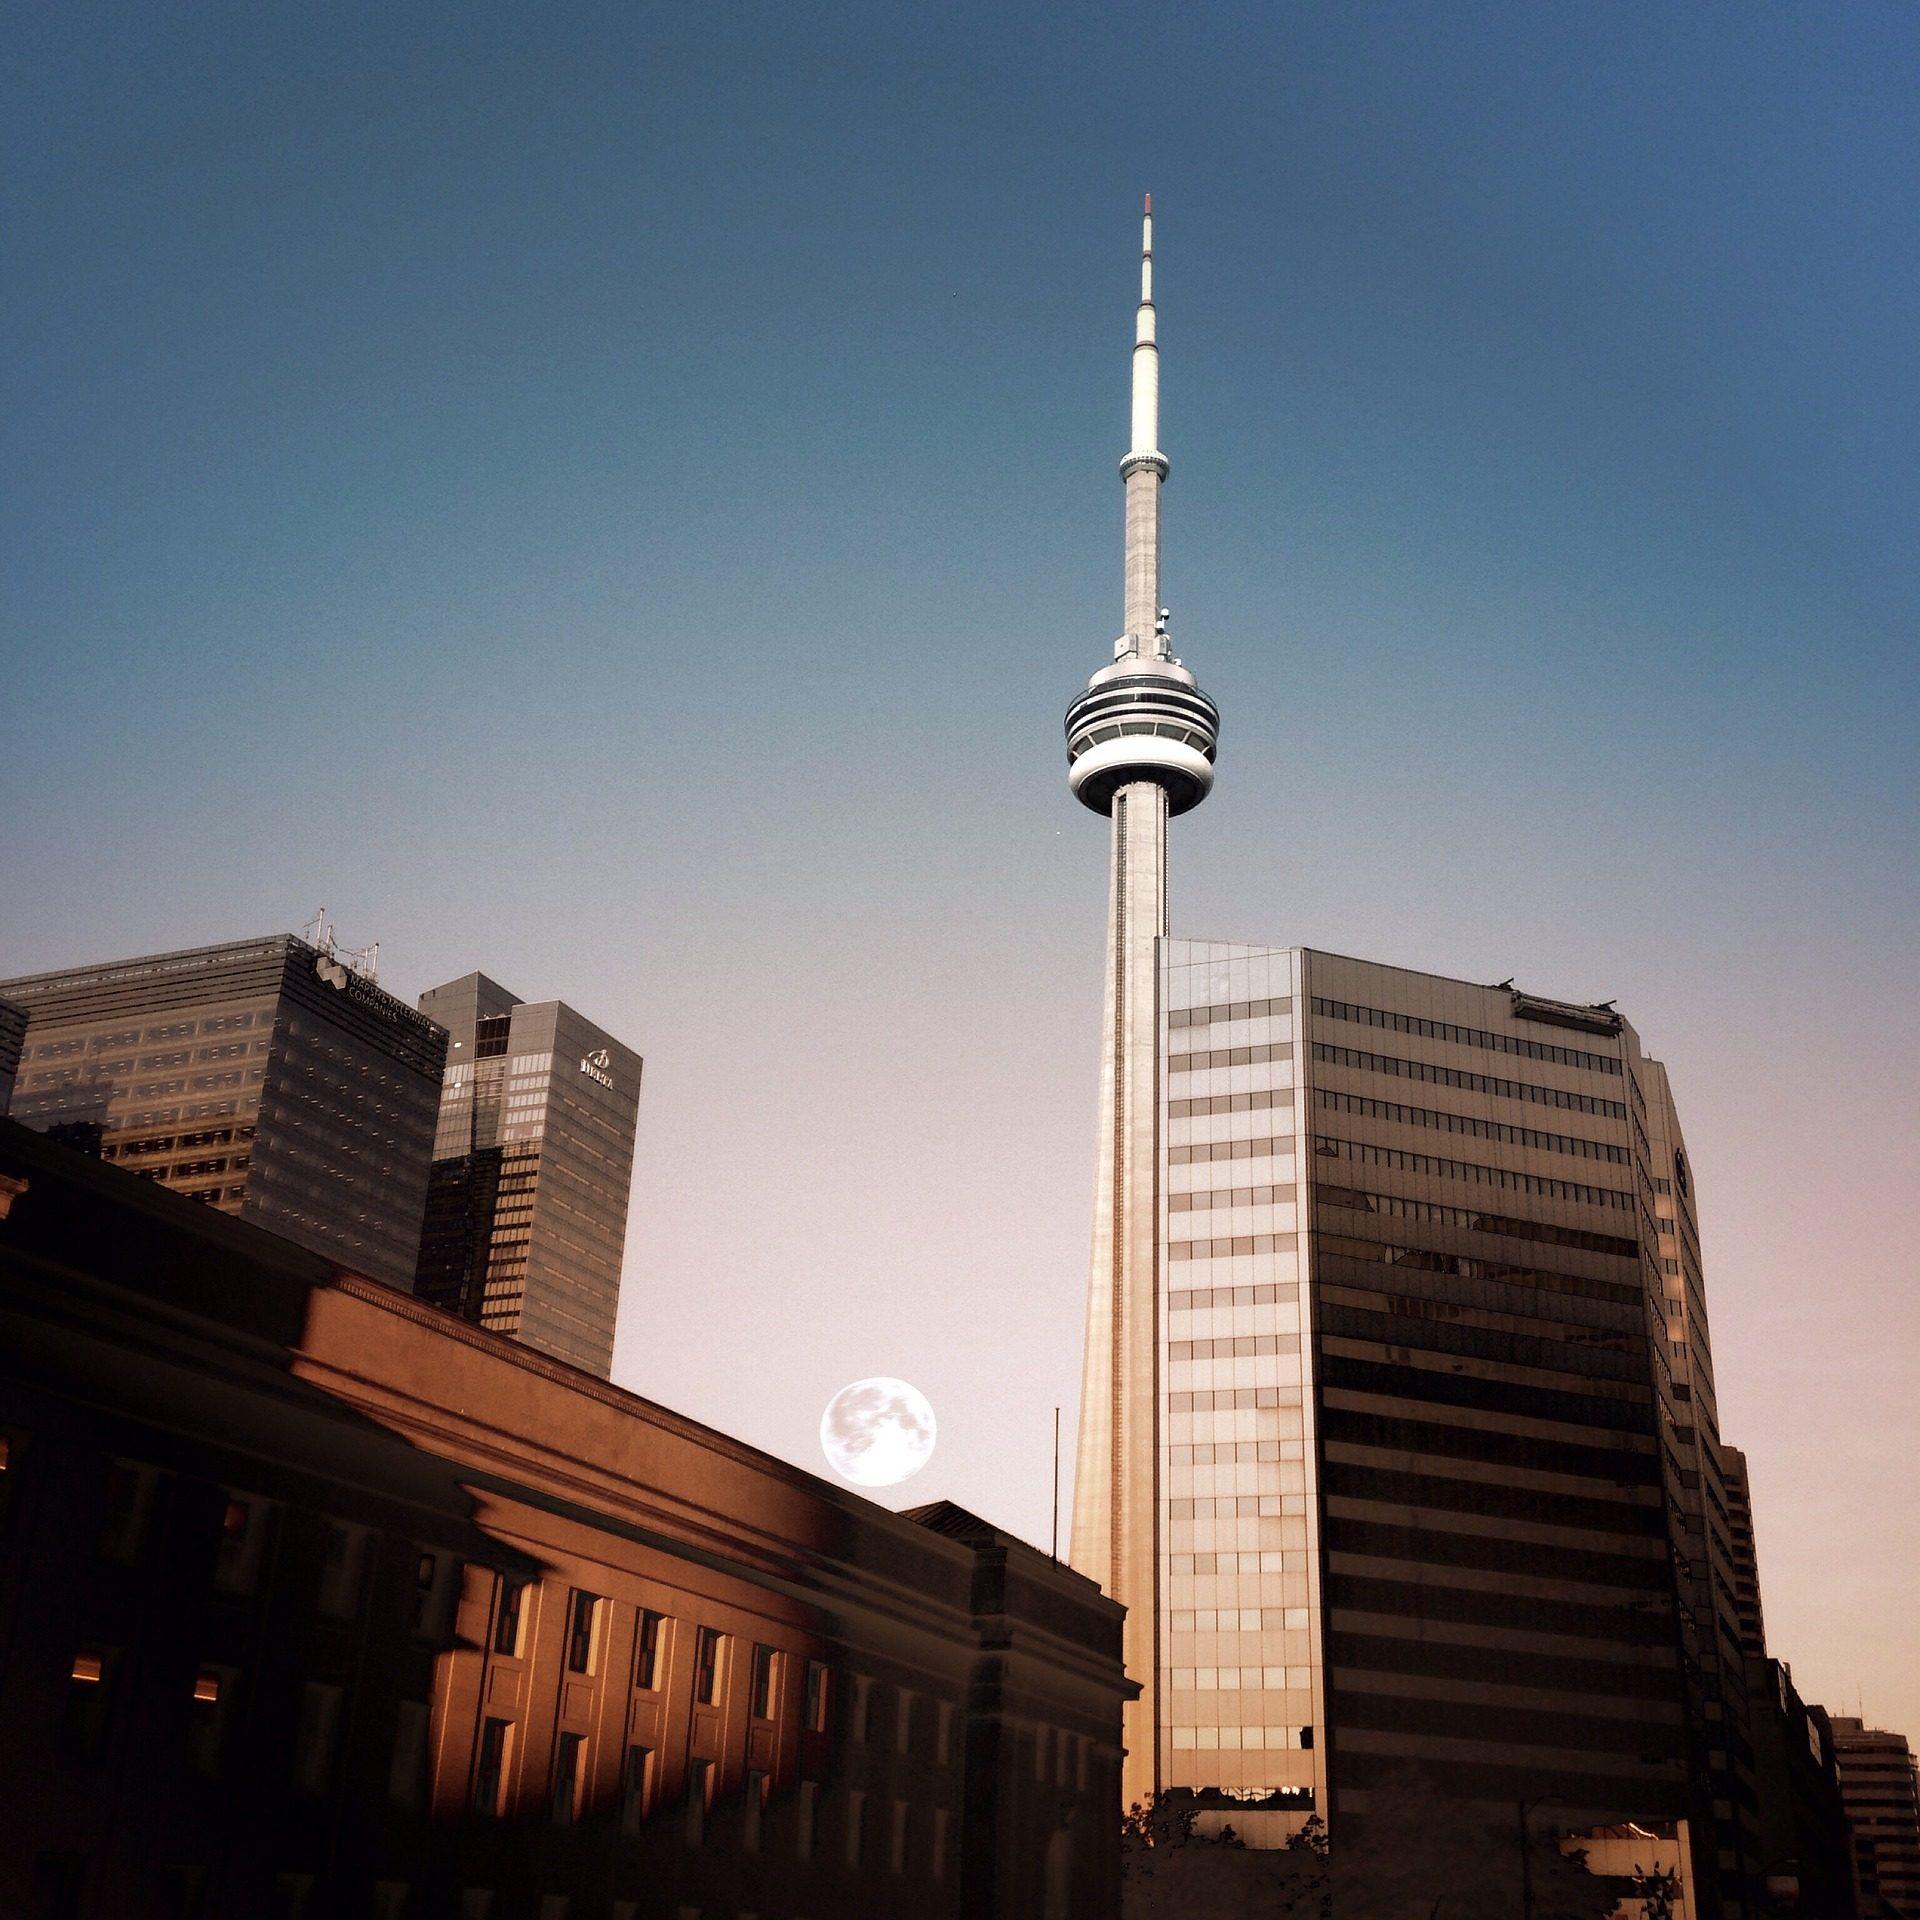 Wolkenkratzer, Stadt, Turm, Nationalen, CN, Toront, Kanada - Wallpaper HD - Prof.-falken.com